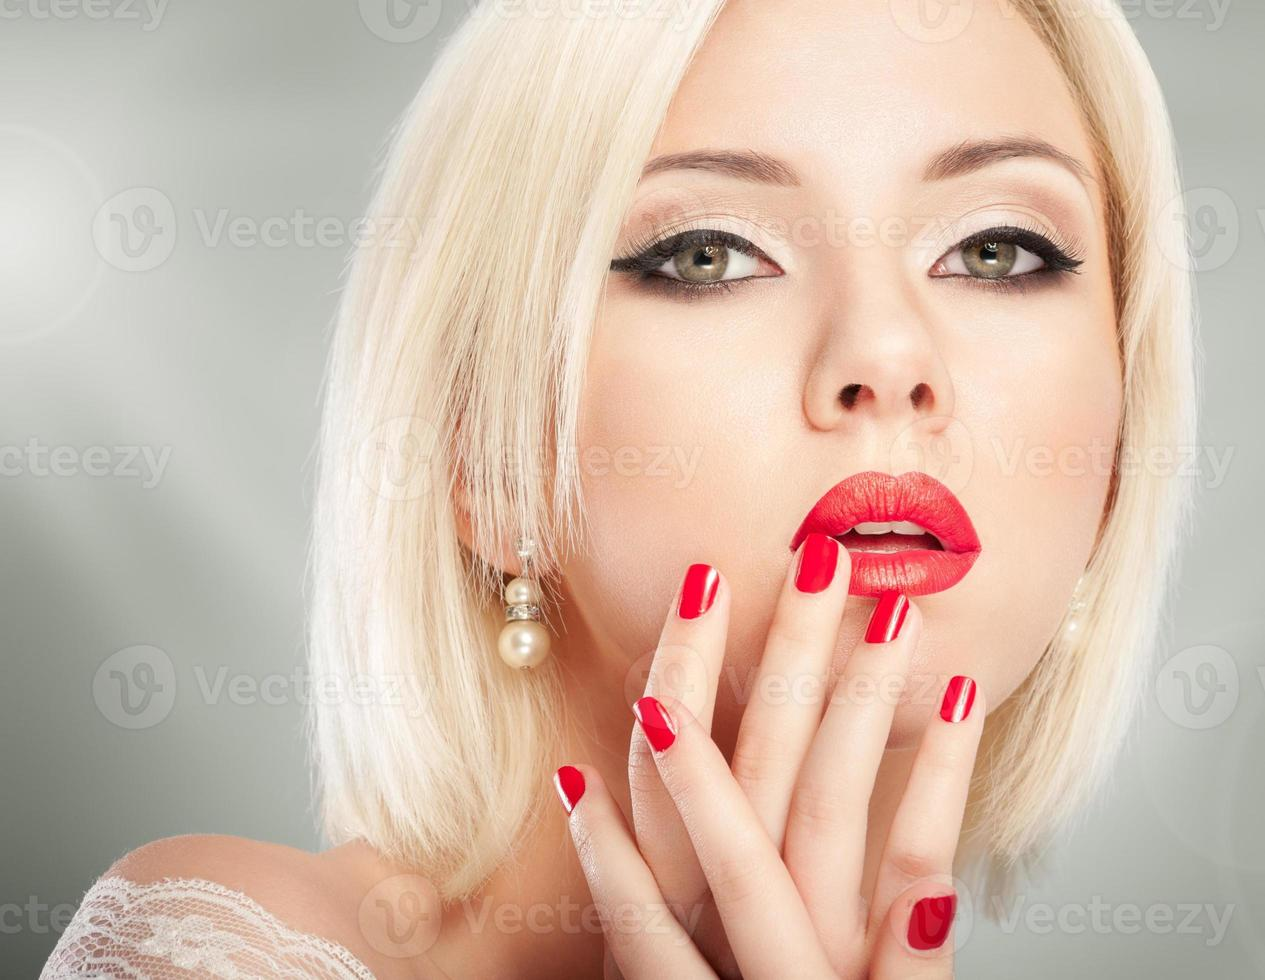 cara de mujer rubia foto